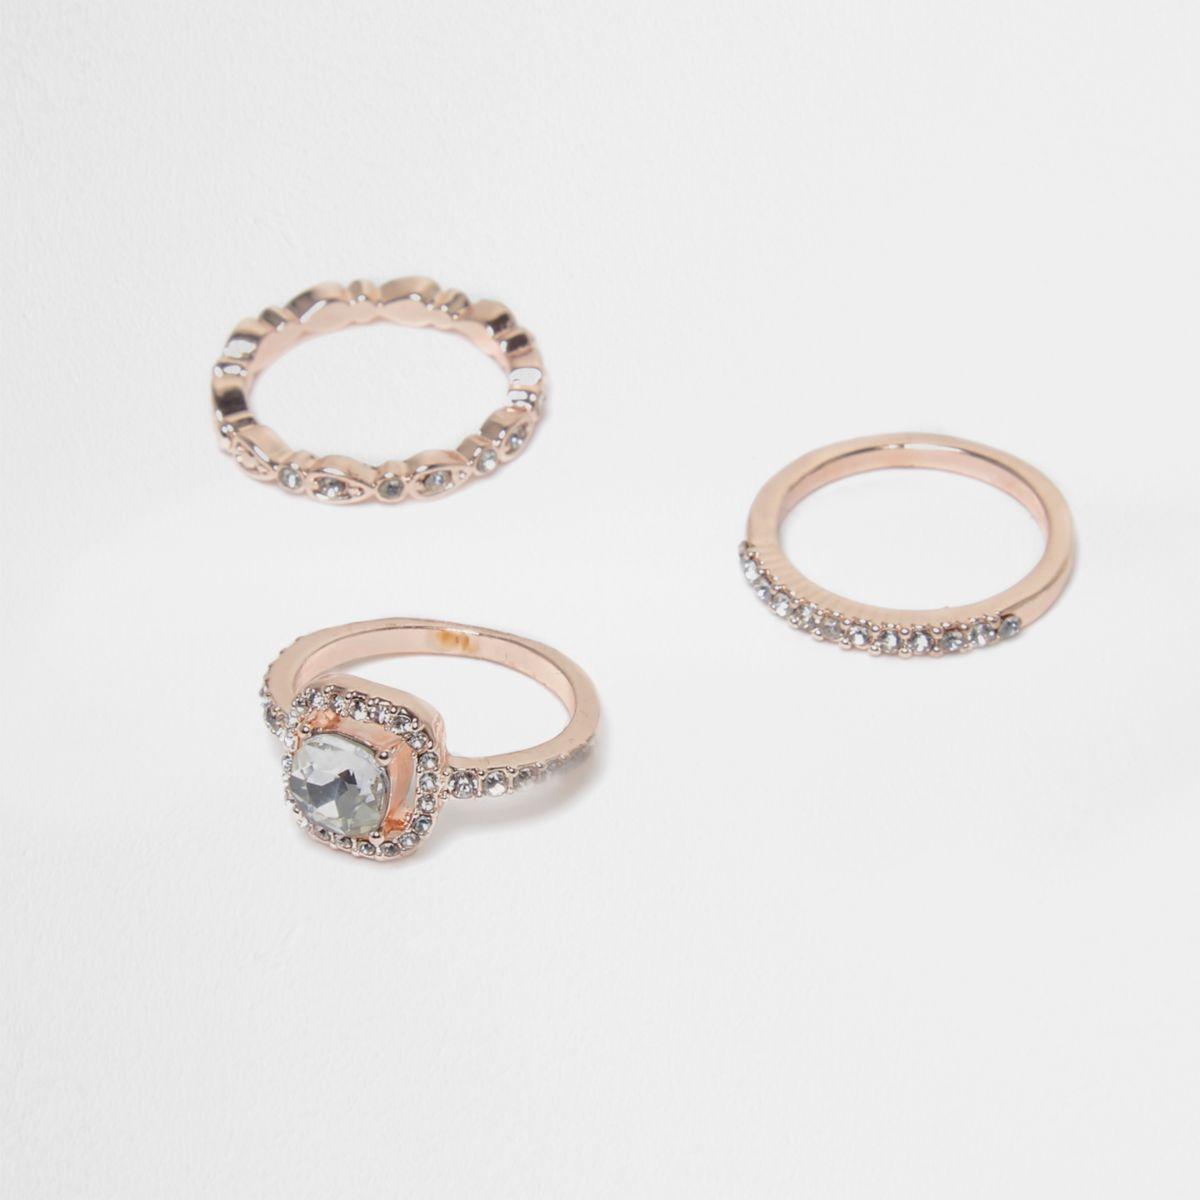 Verzierte Ringe in Roségold, Set